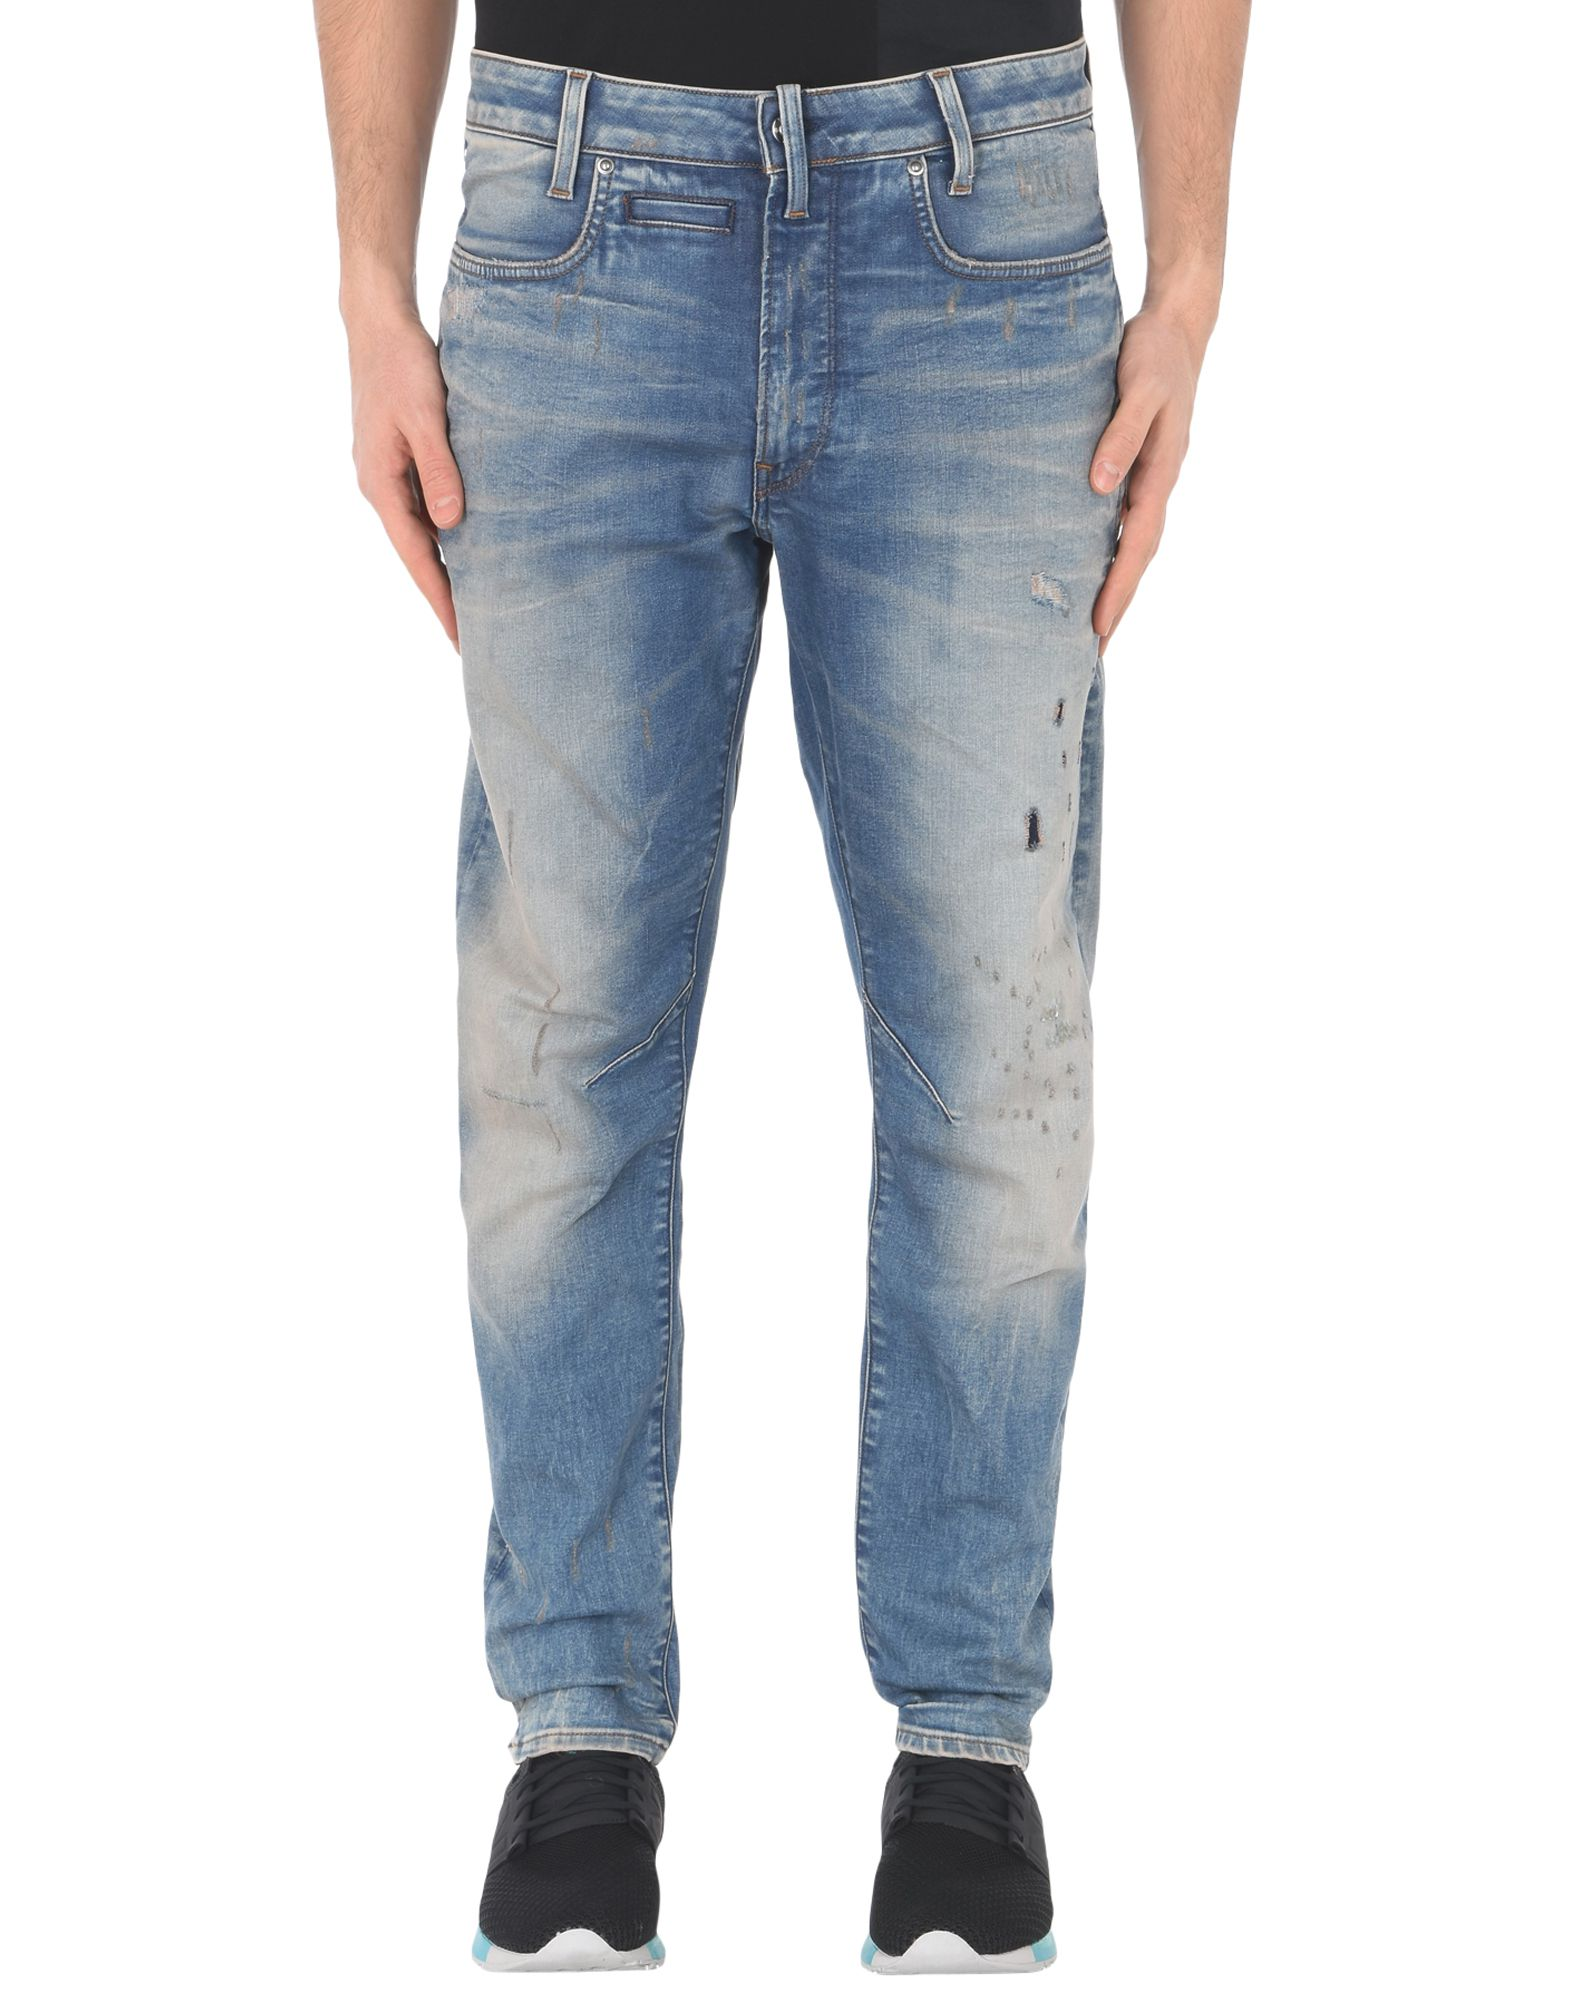 Pantaloni Jeans G-Star Raw Uomo - Acquista online su